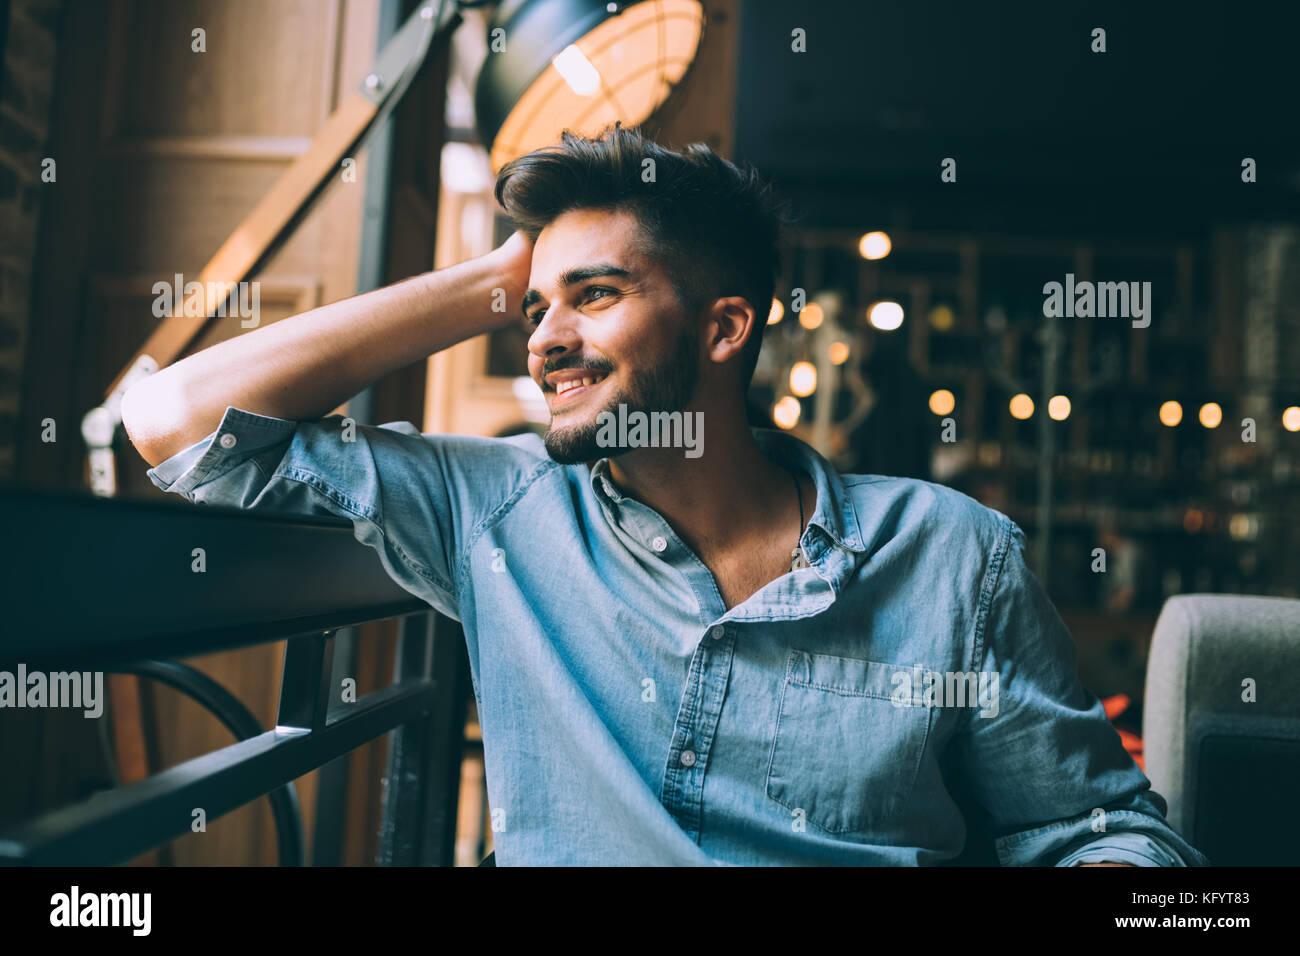 Porträt der jungen hübschen Mann im blauen Hemd Stockbild